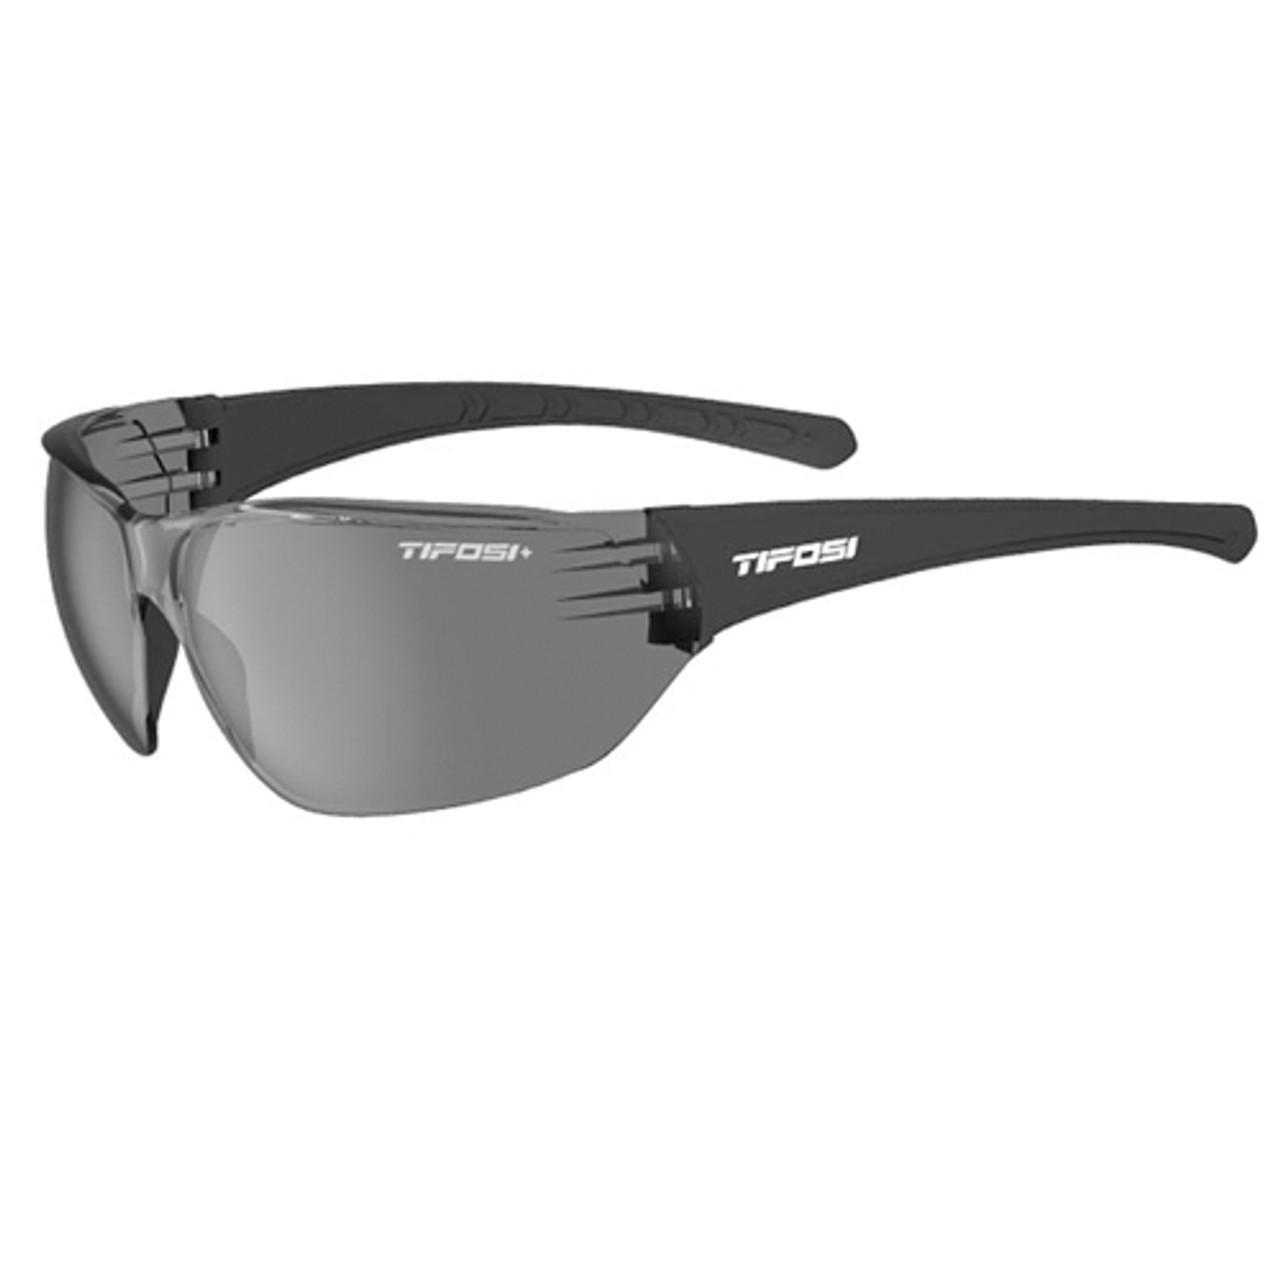 Tifosi Optics Masso Safety Shooting Sunglasses